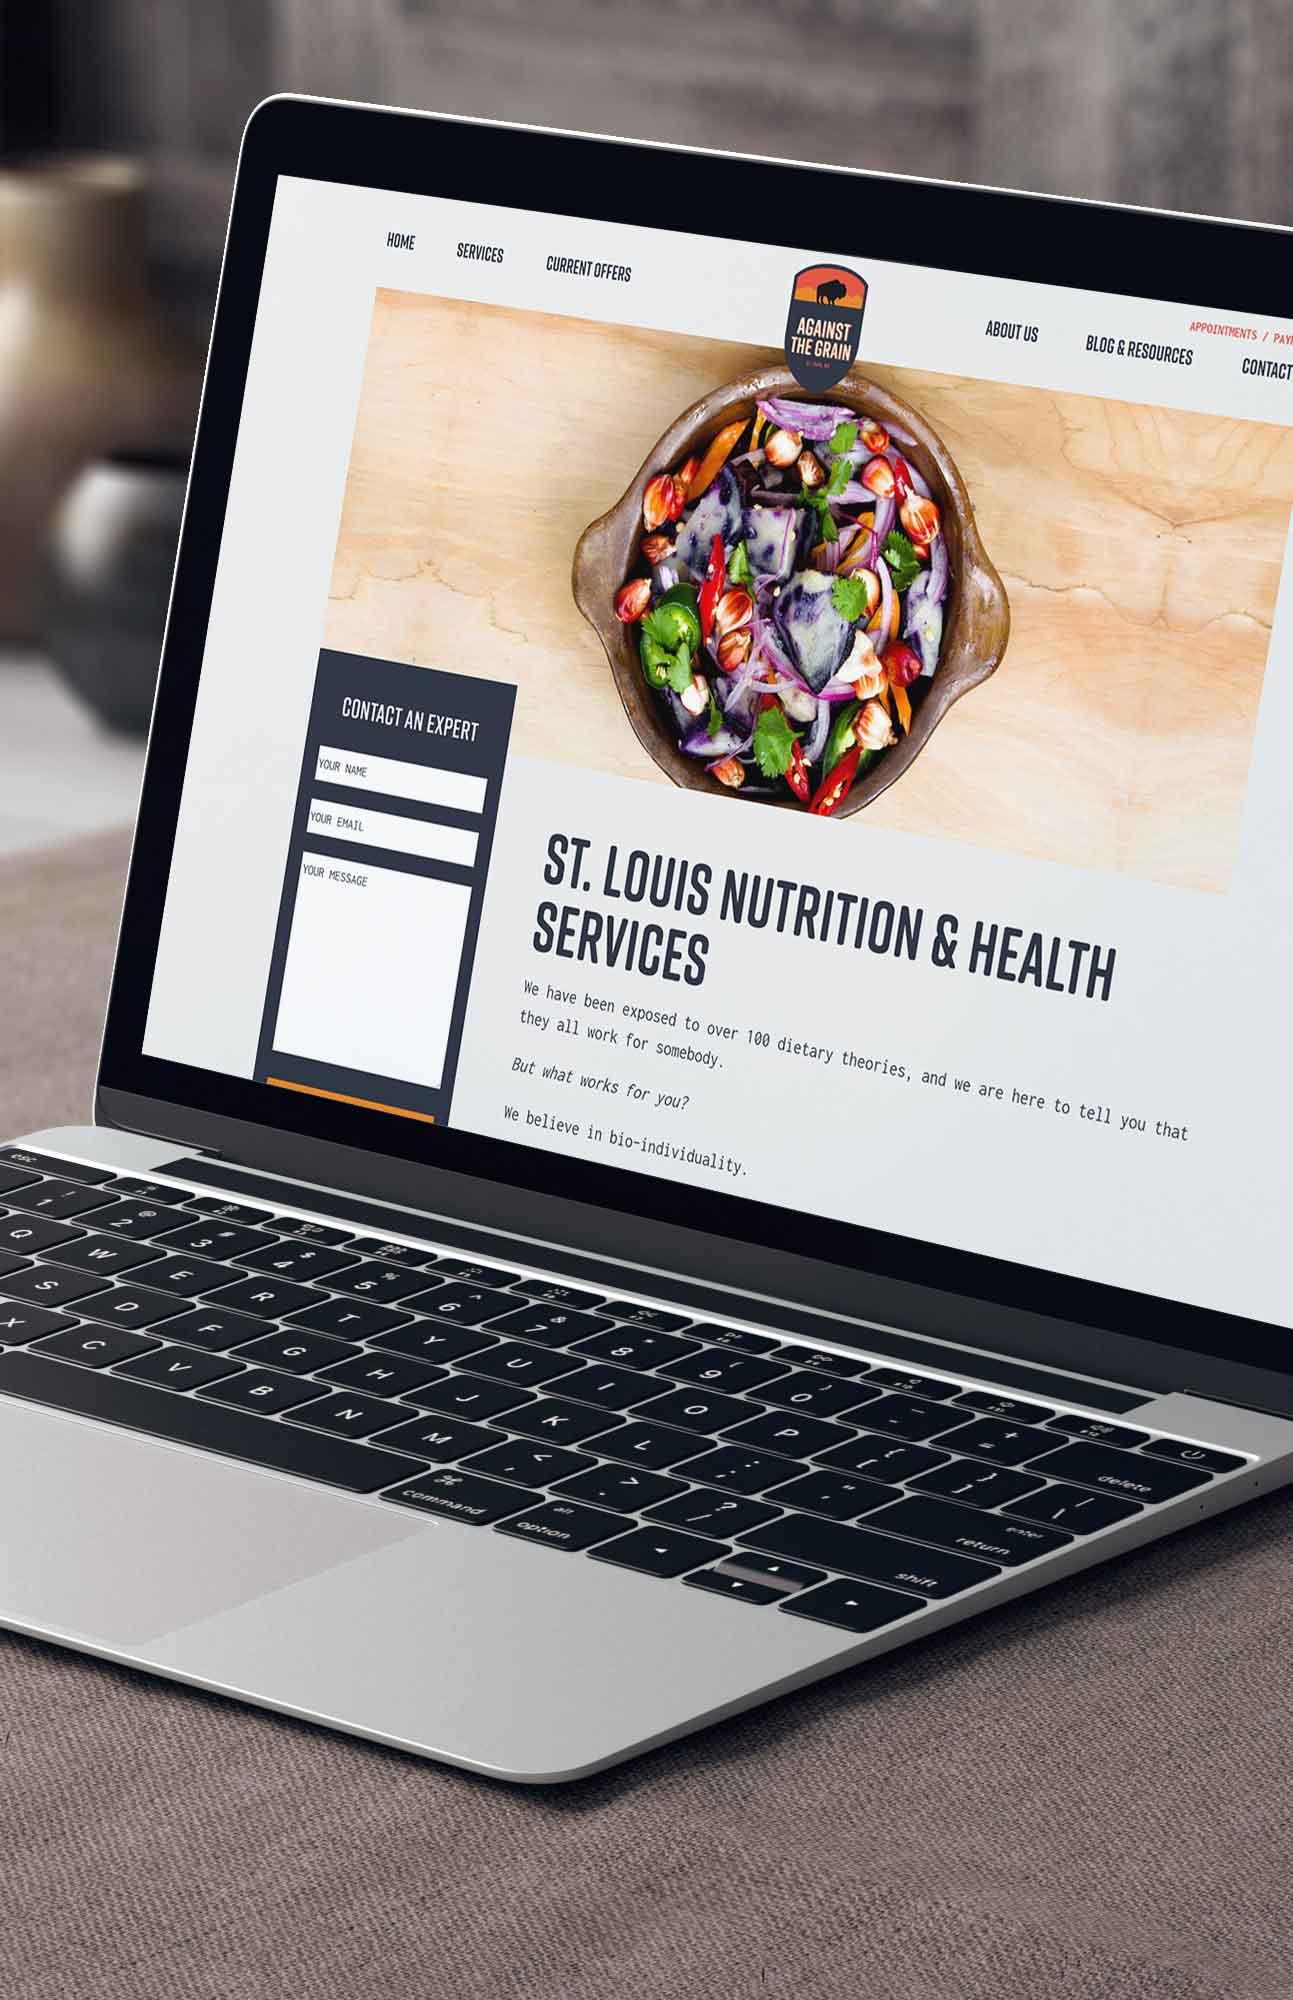 St. Louis web design company